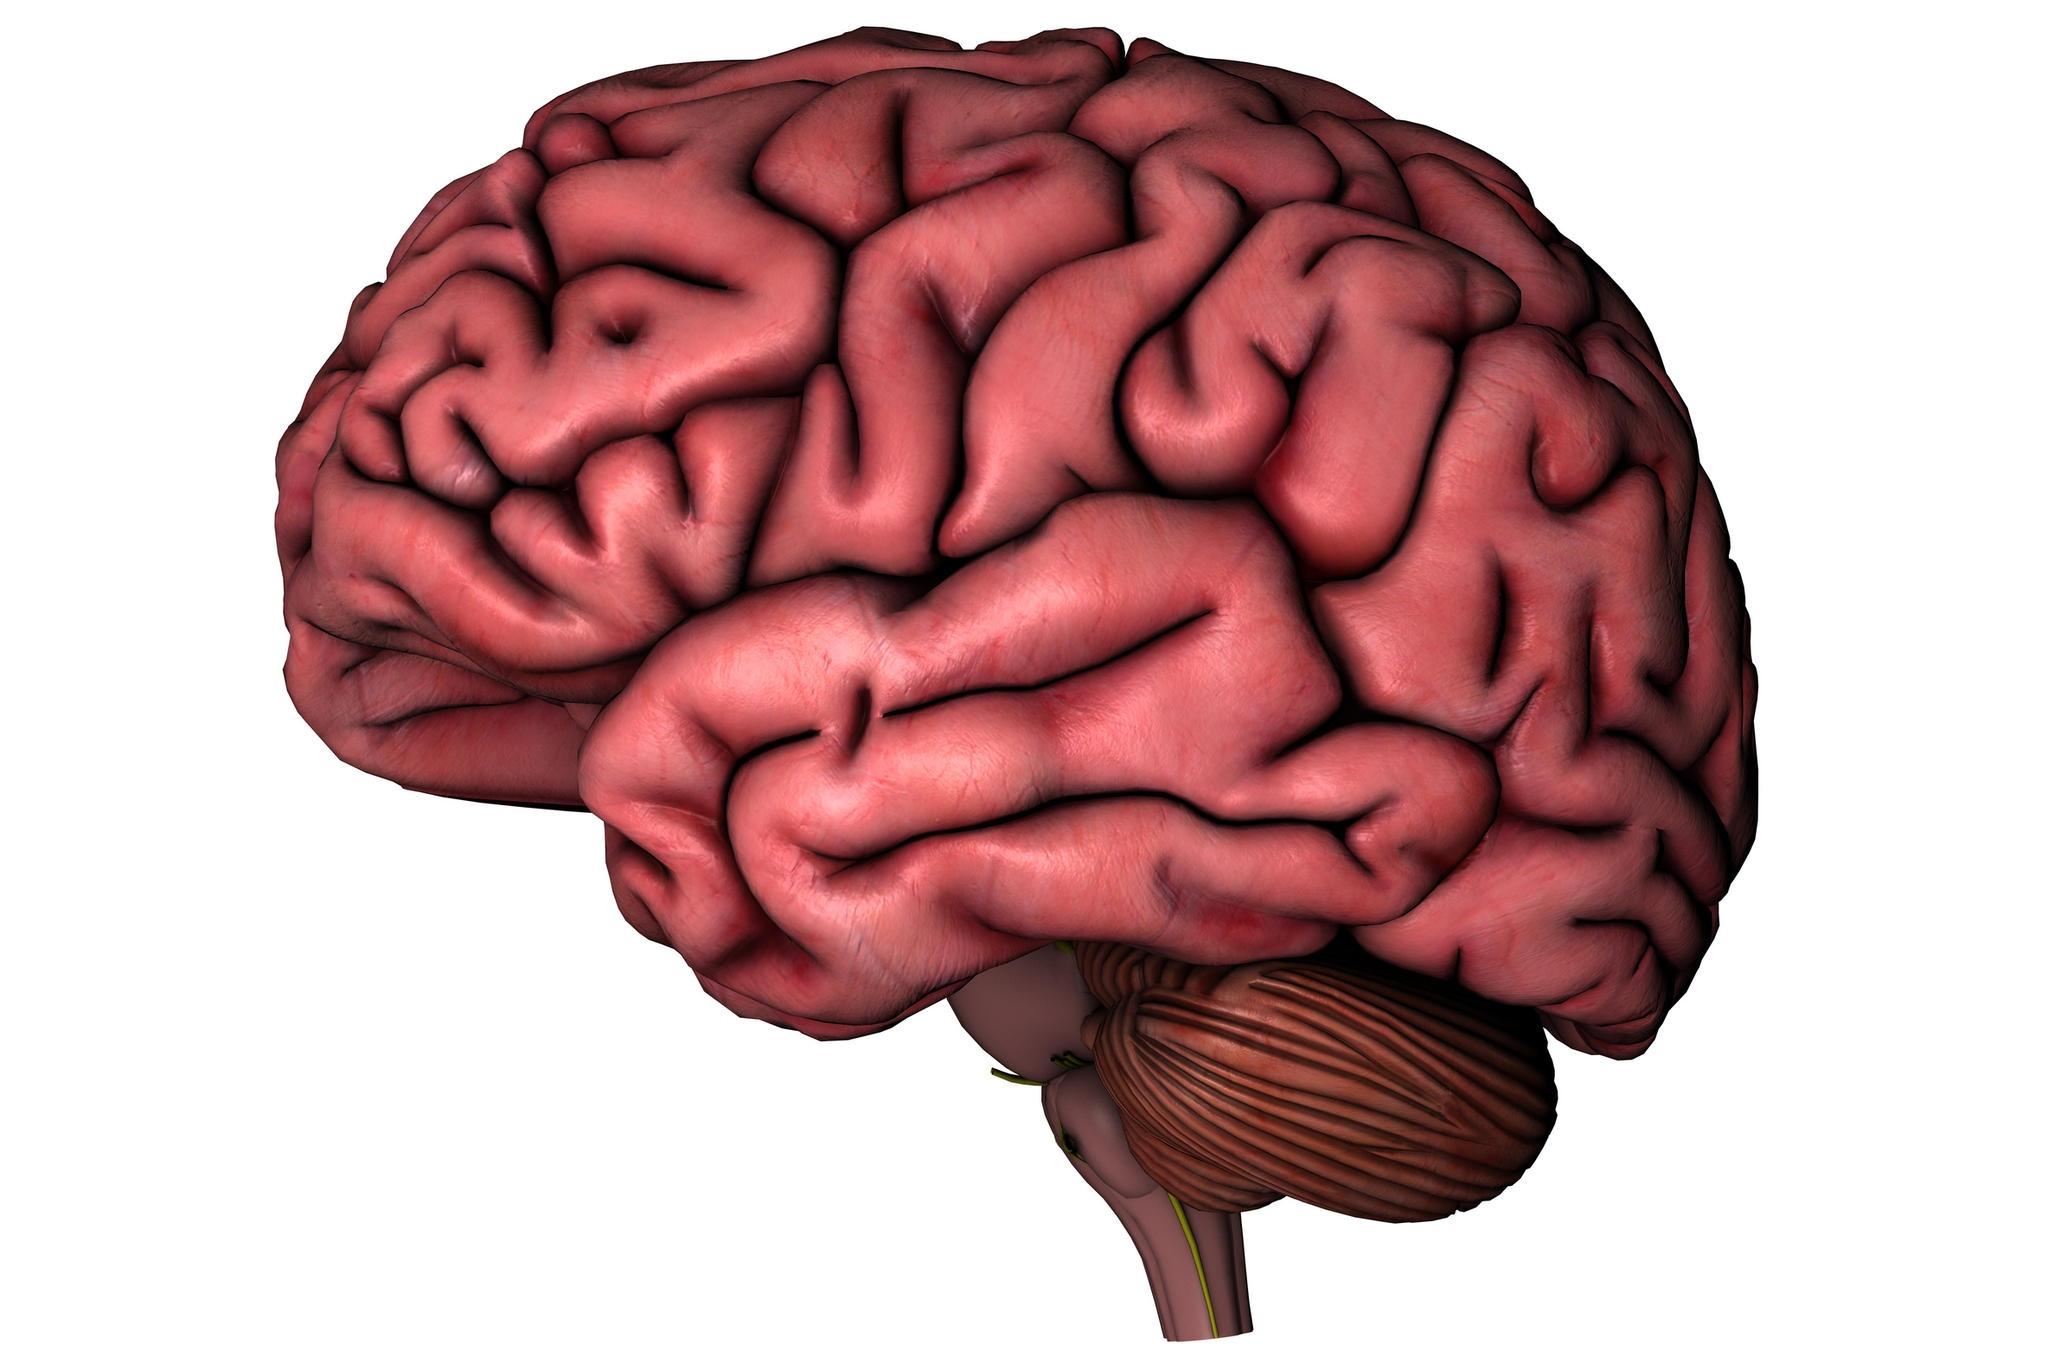 Human Brain Clipart For Kids.